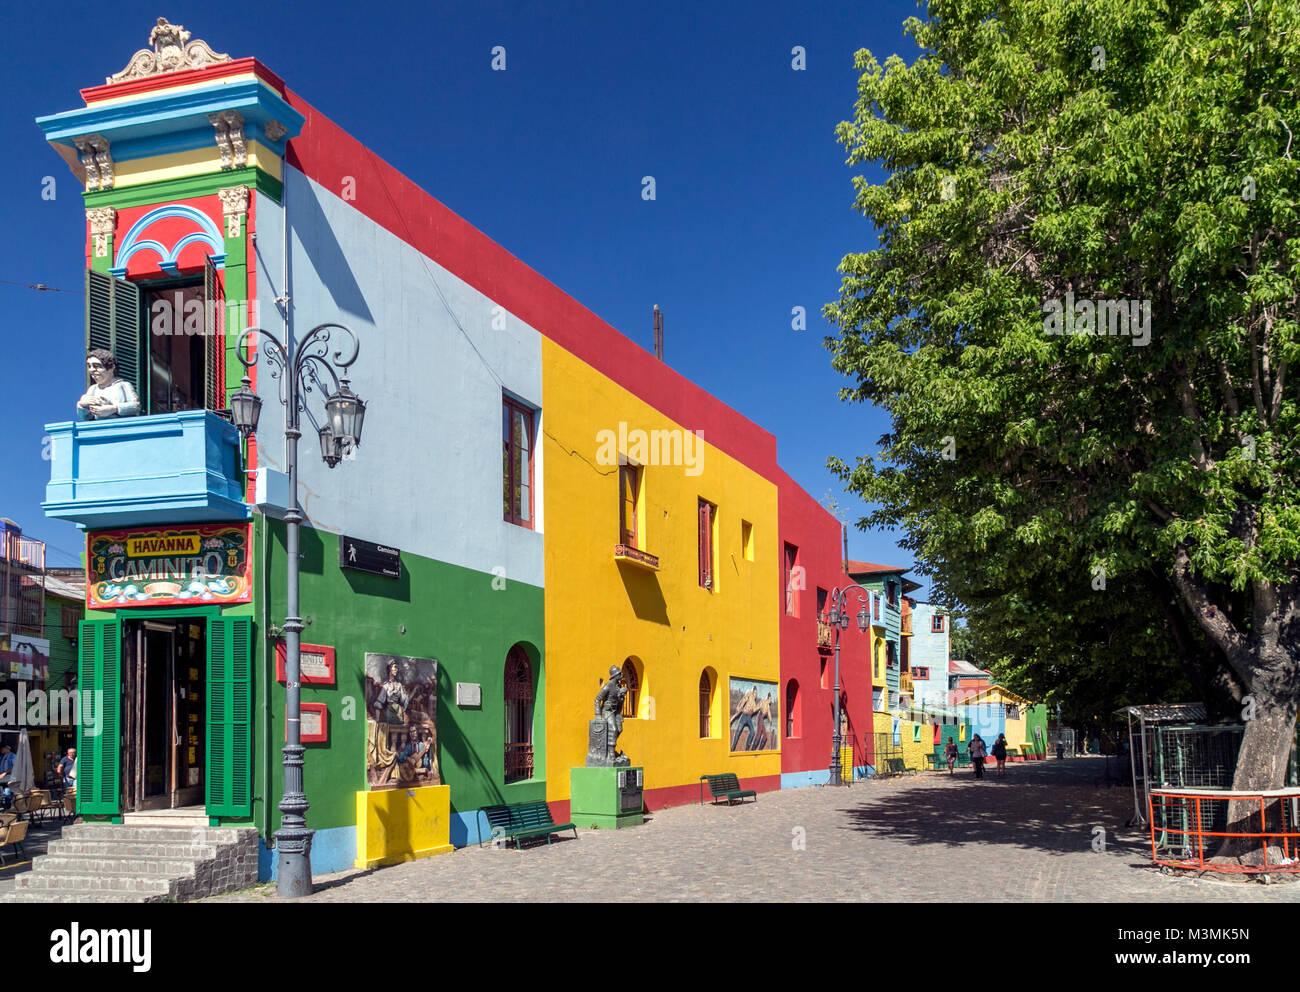 Caminito, La Boca. Buenos Aires, Argentina - Stock Image